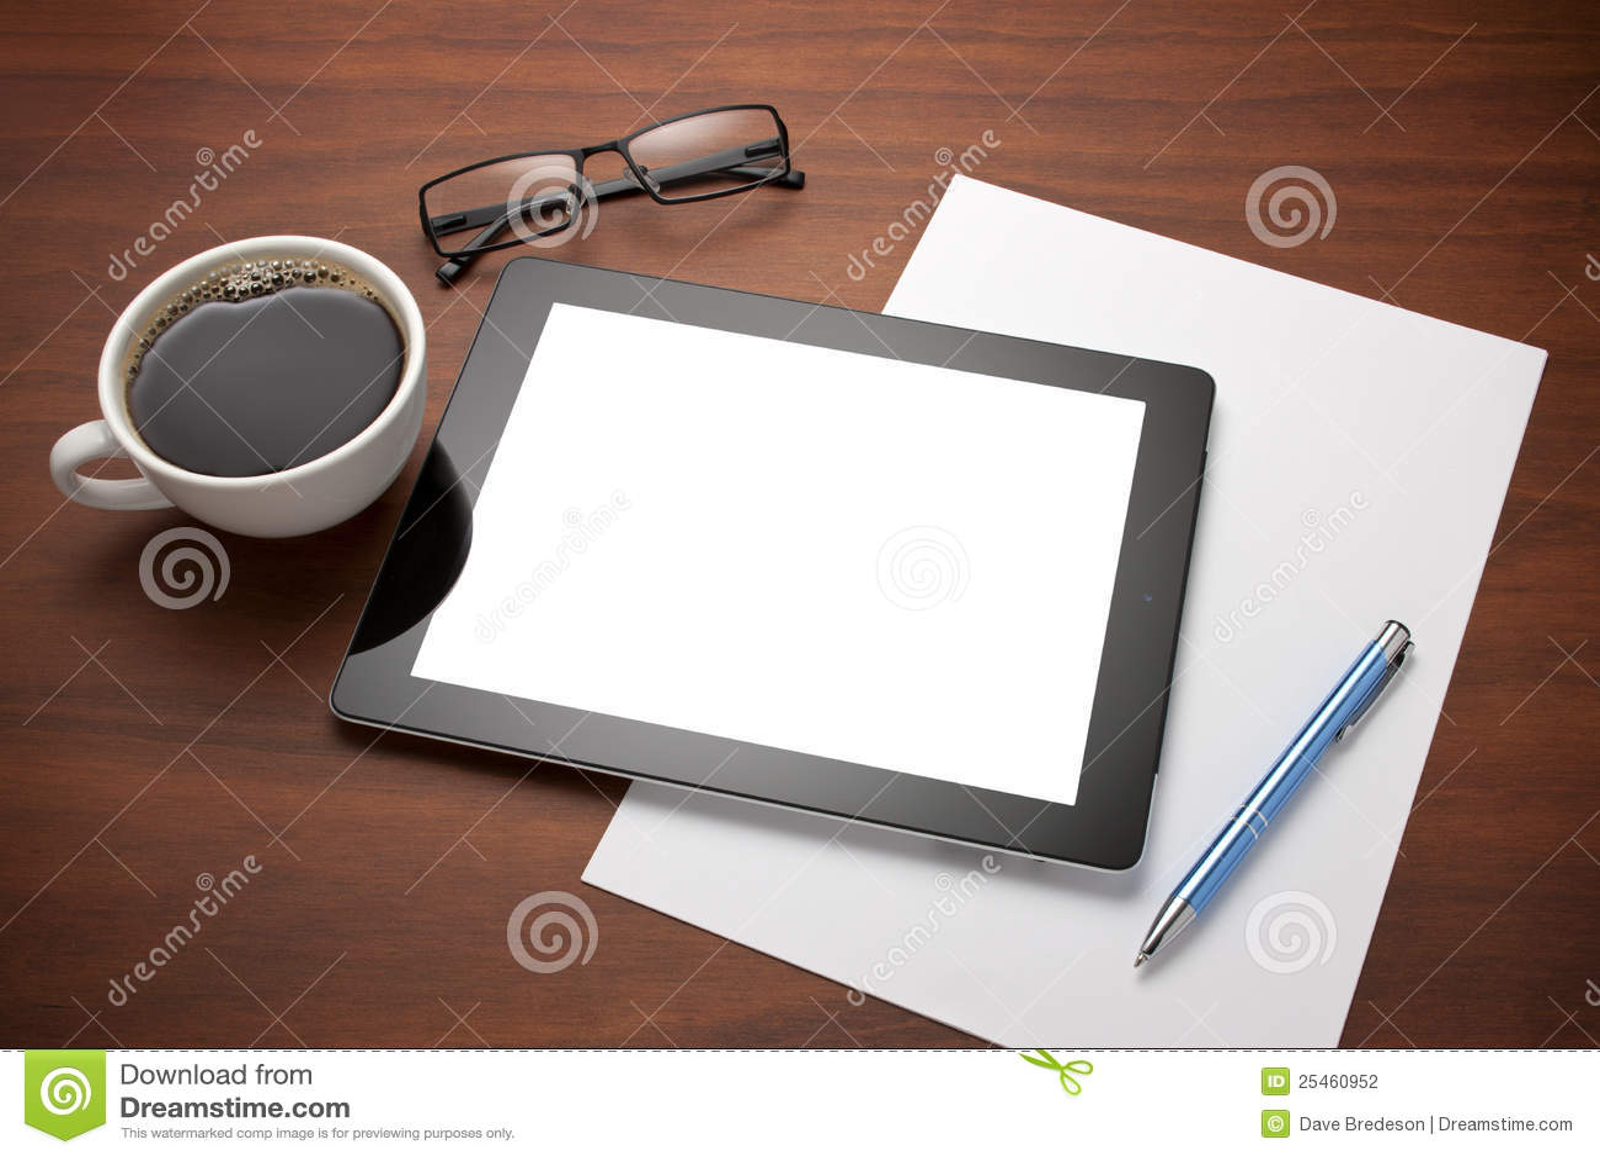 Business Tablet Workplace Desk